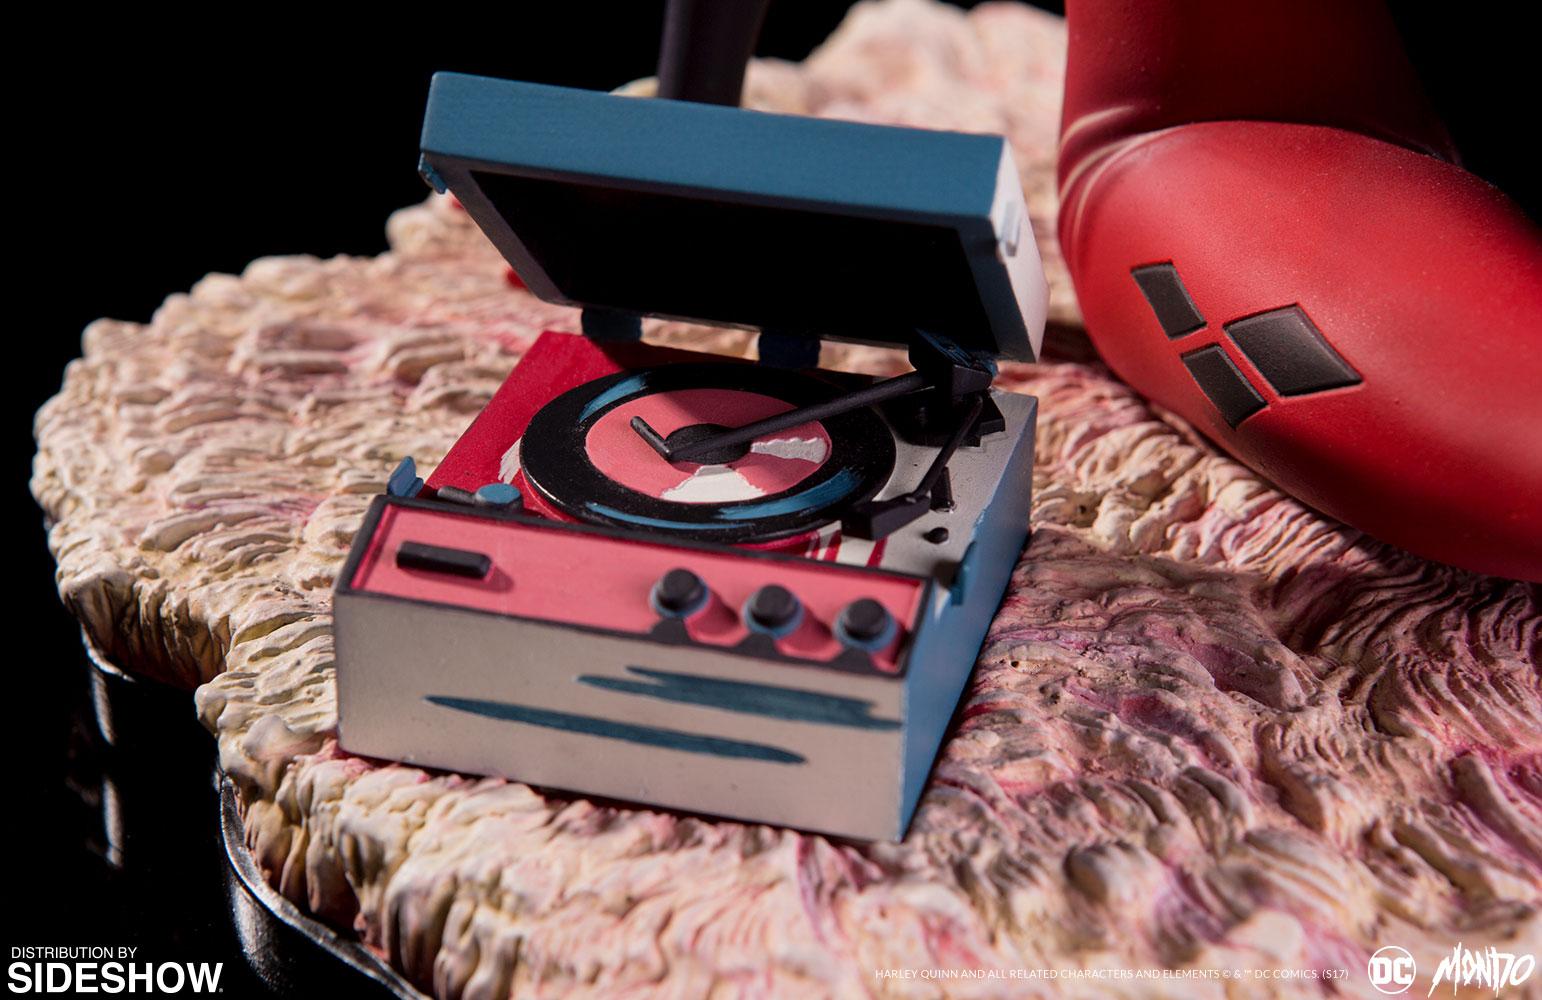 dc-comics-waiting-for-my-j-man-harley-quinn-statue-mondo-902952-10 Figurine - Harley Quinn - Waiting for My J Man